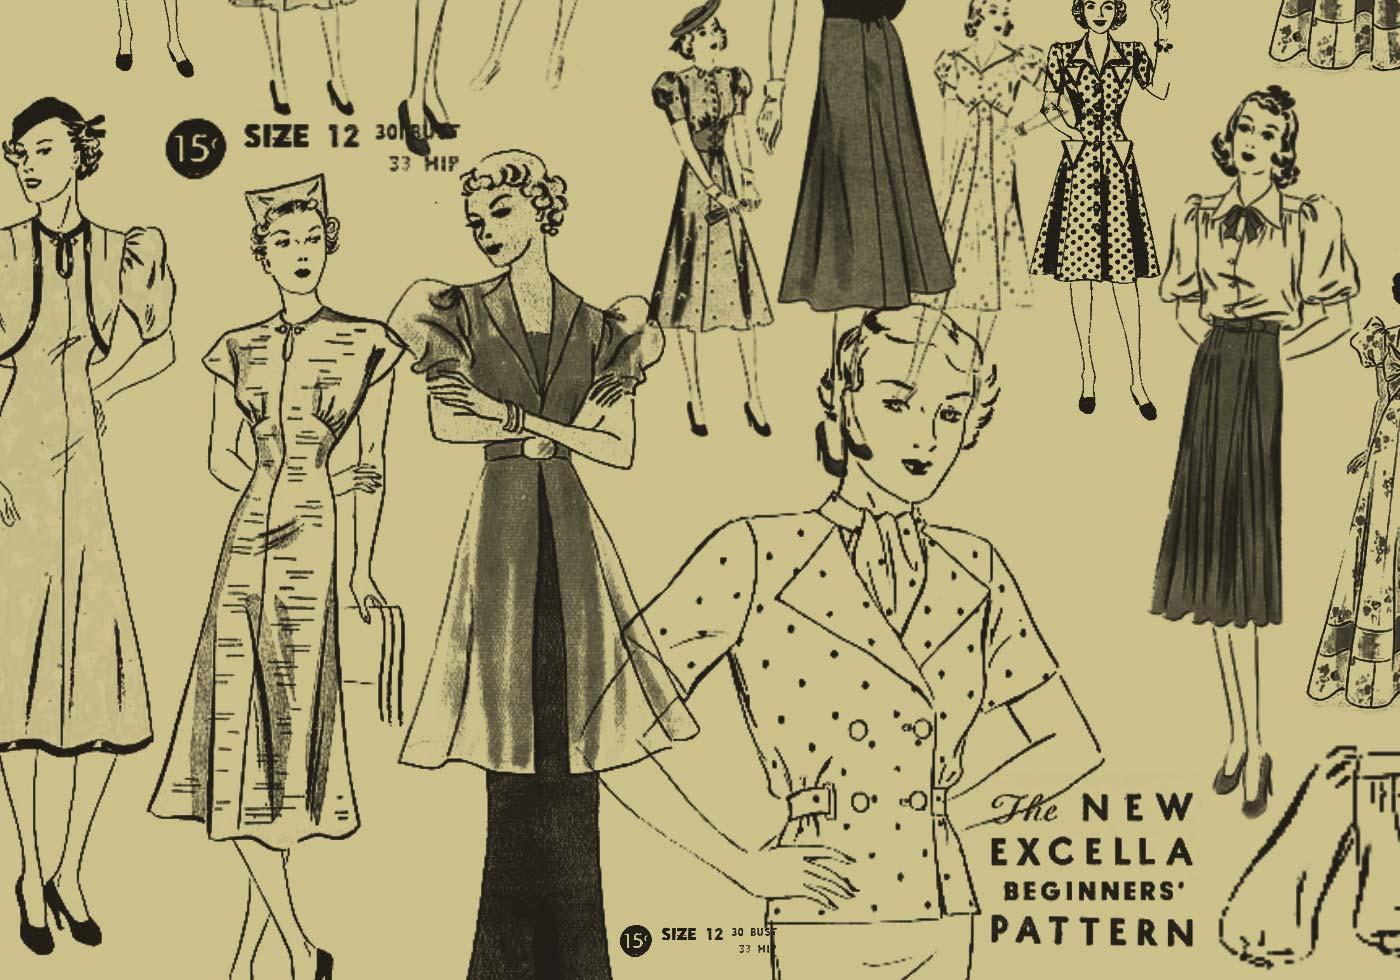 Vintage pattern girls free photoshop brushes at brusheezy